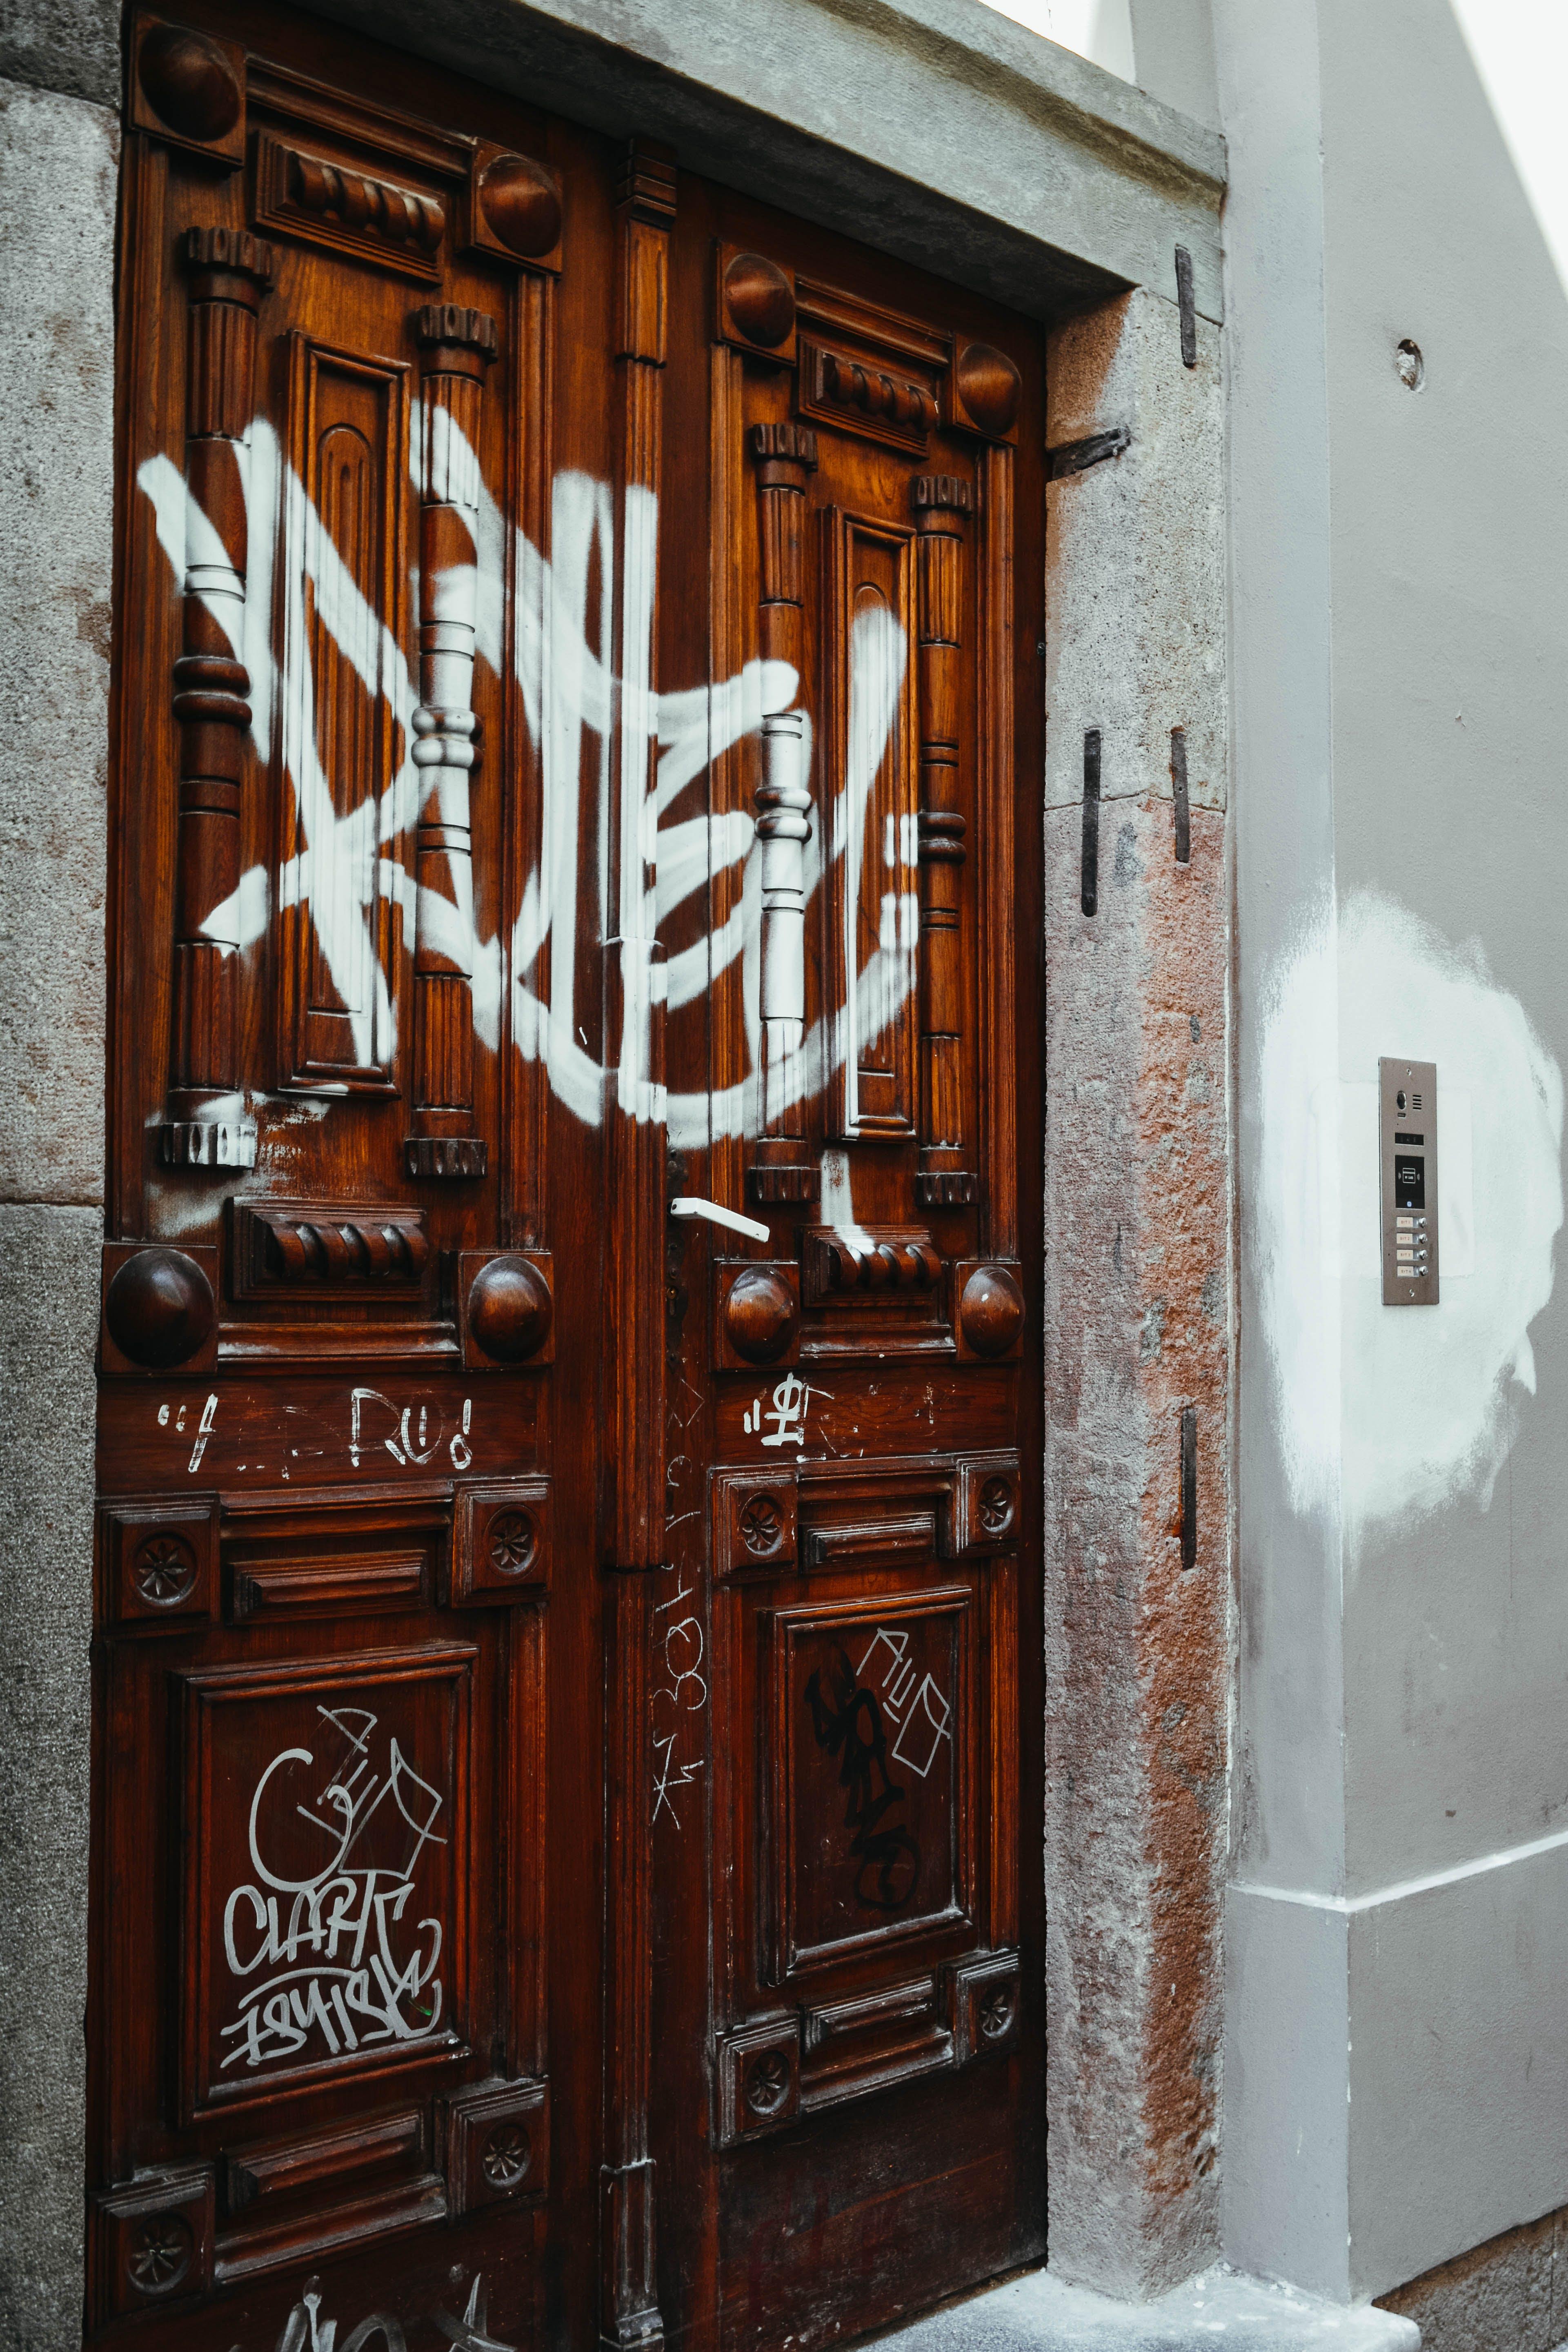 Gratis arkivbilde med bygning, dør, døråpning, graffiti